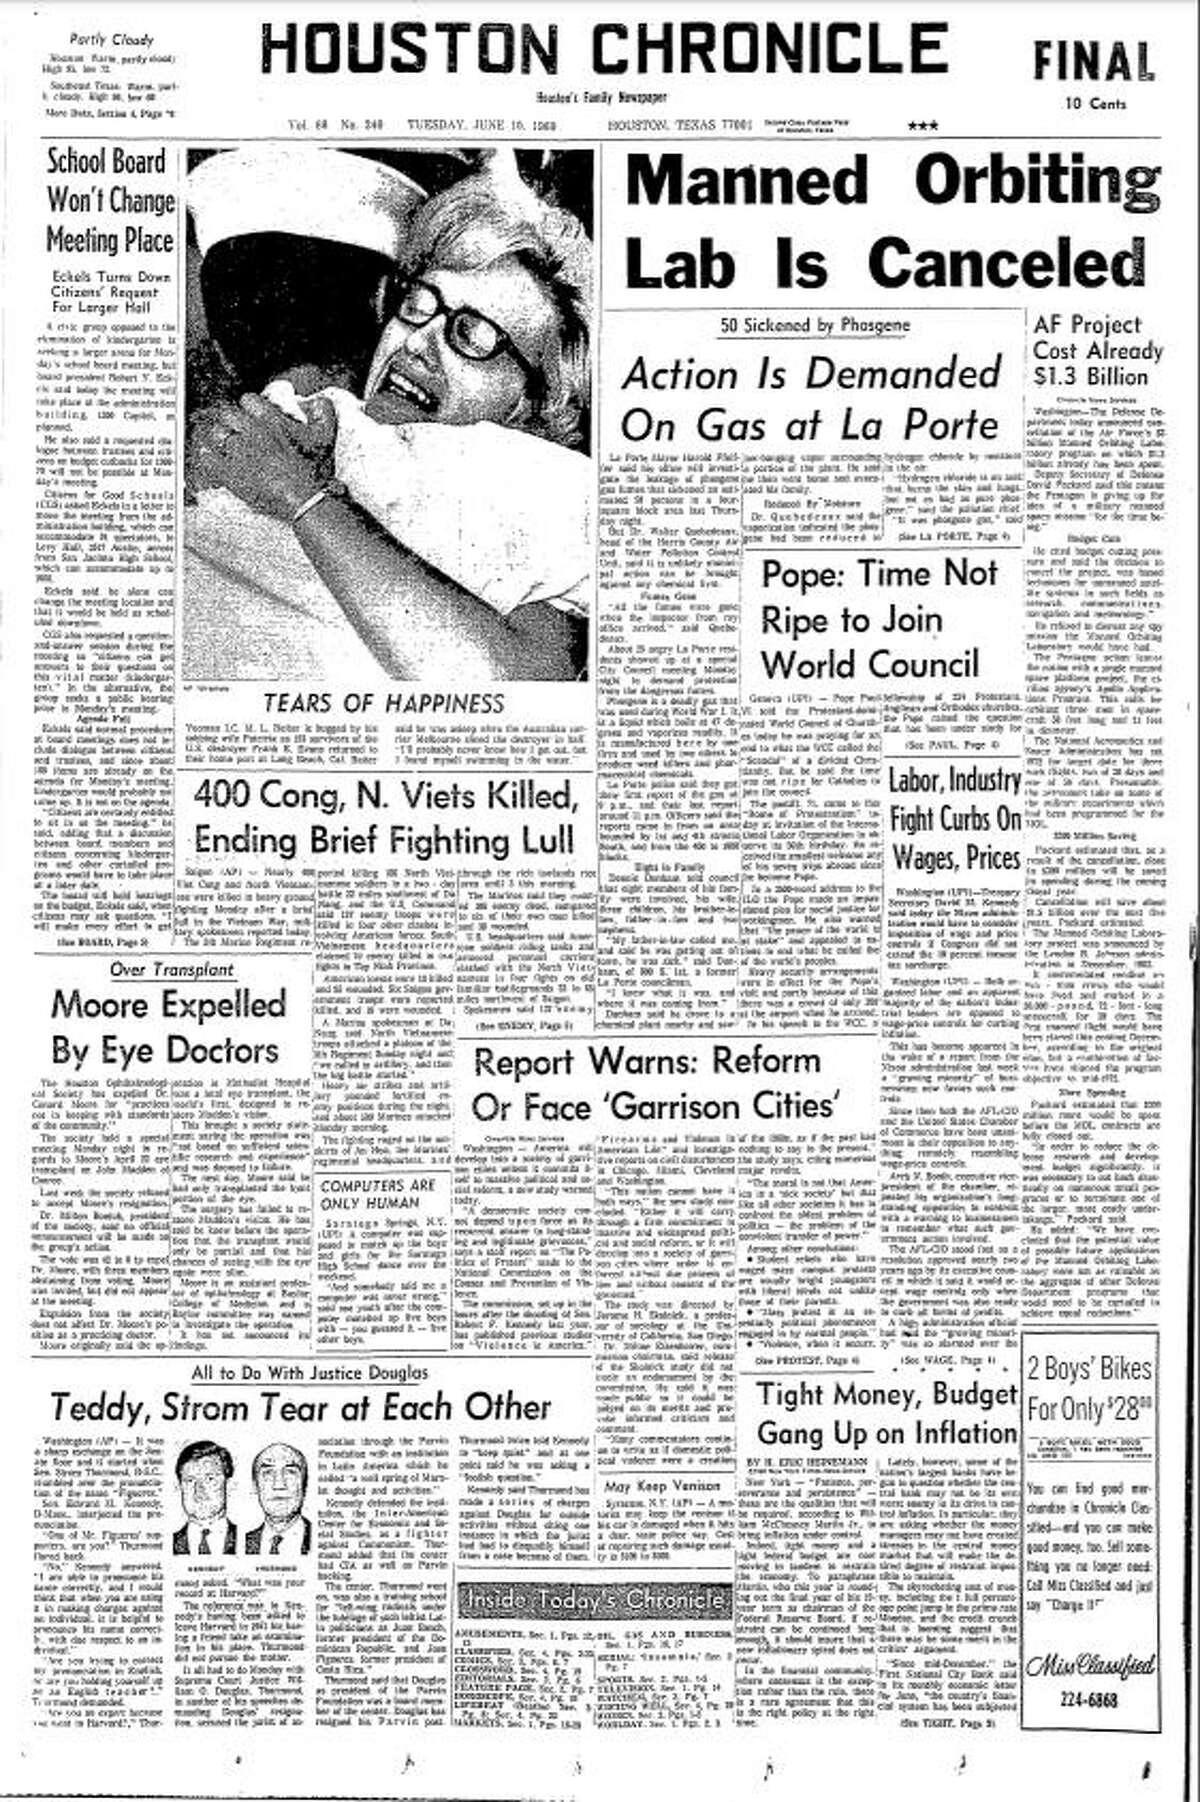 June 10, 1969